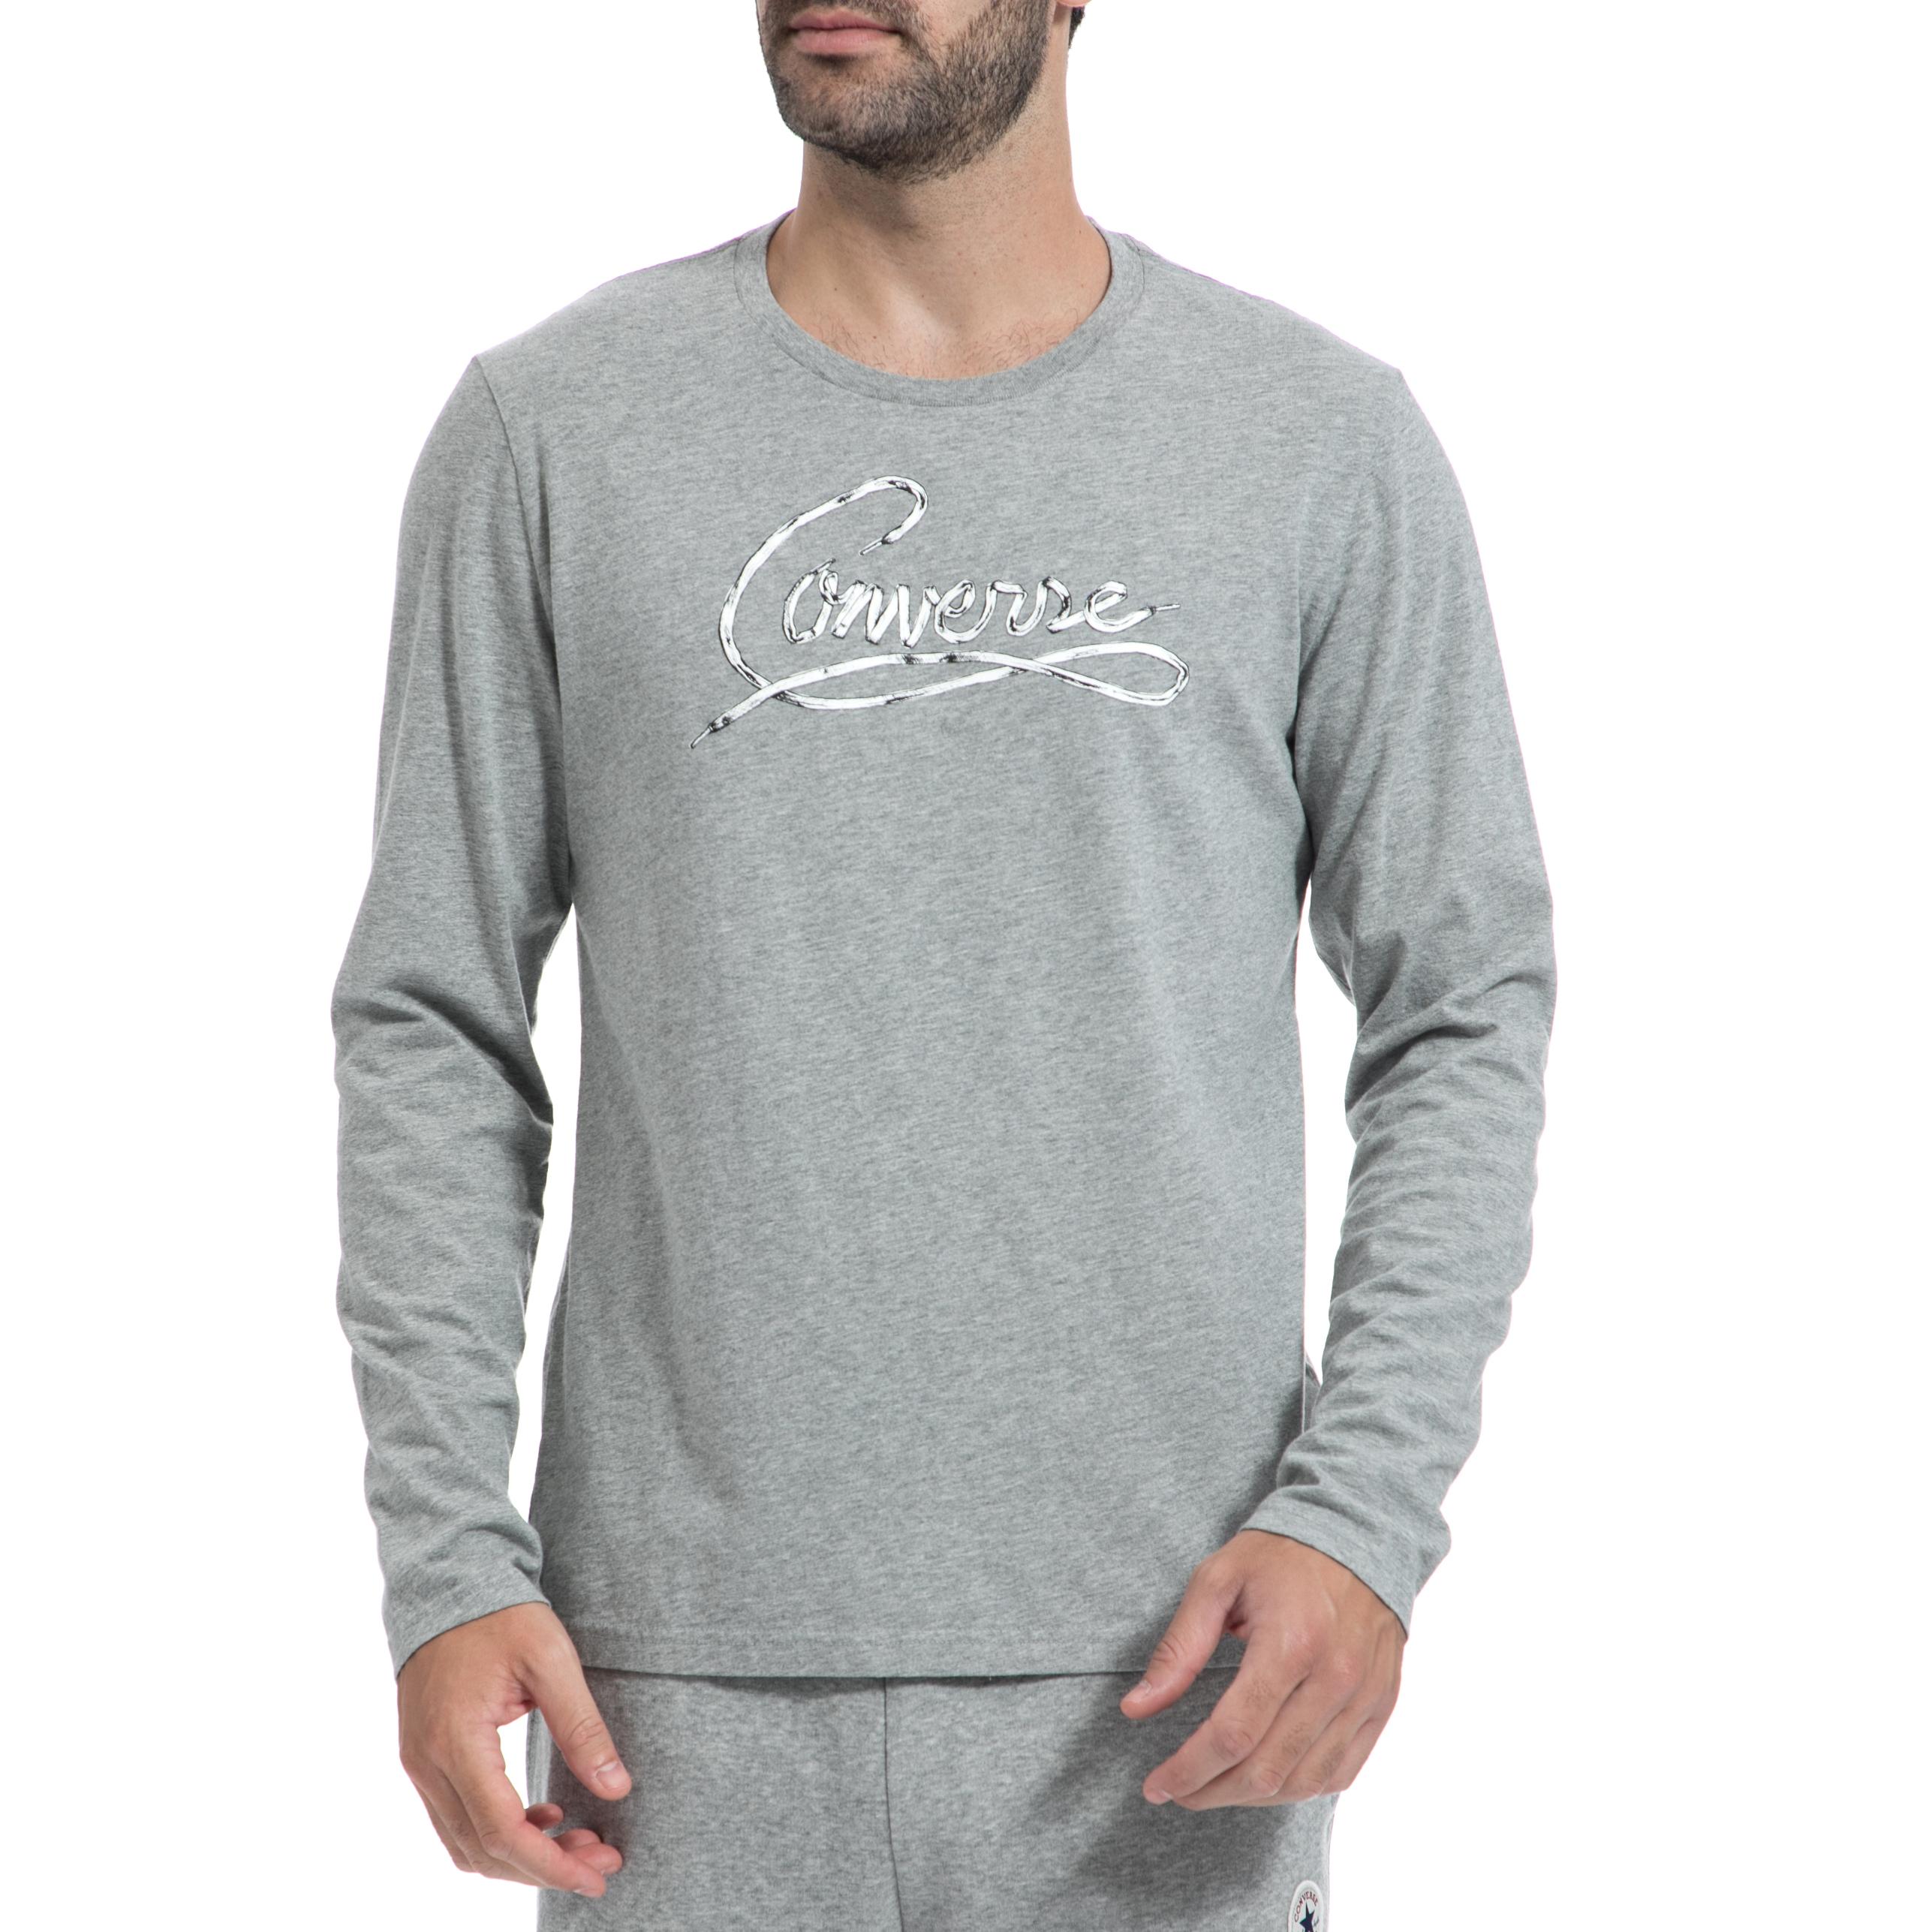 CONVERSE – Ανδρική μπλούζα CONVERSE γκρι